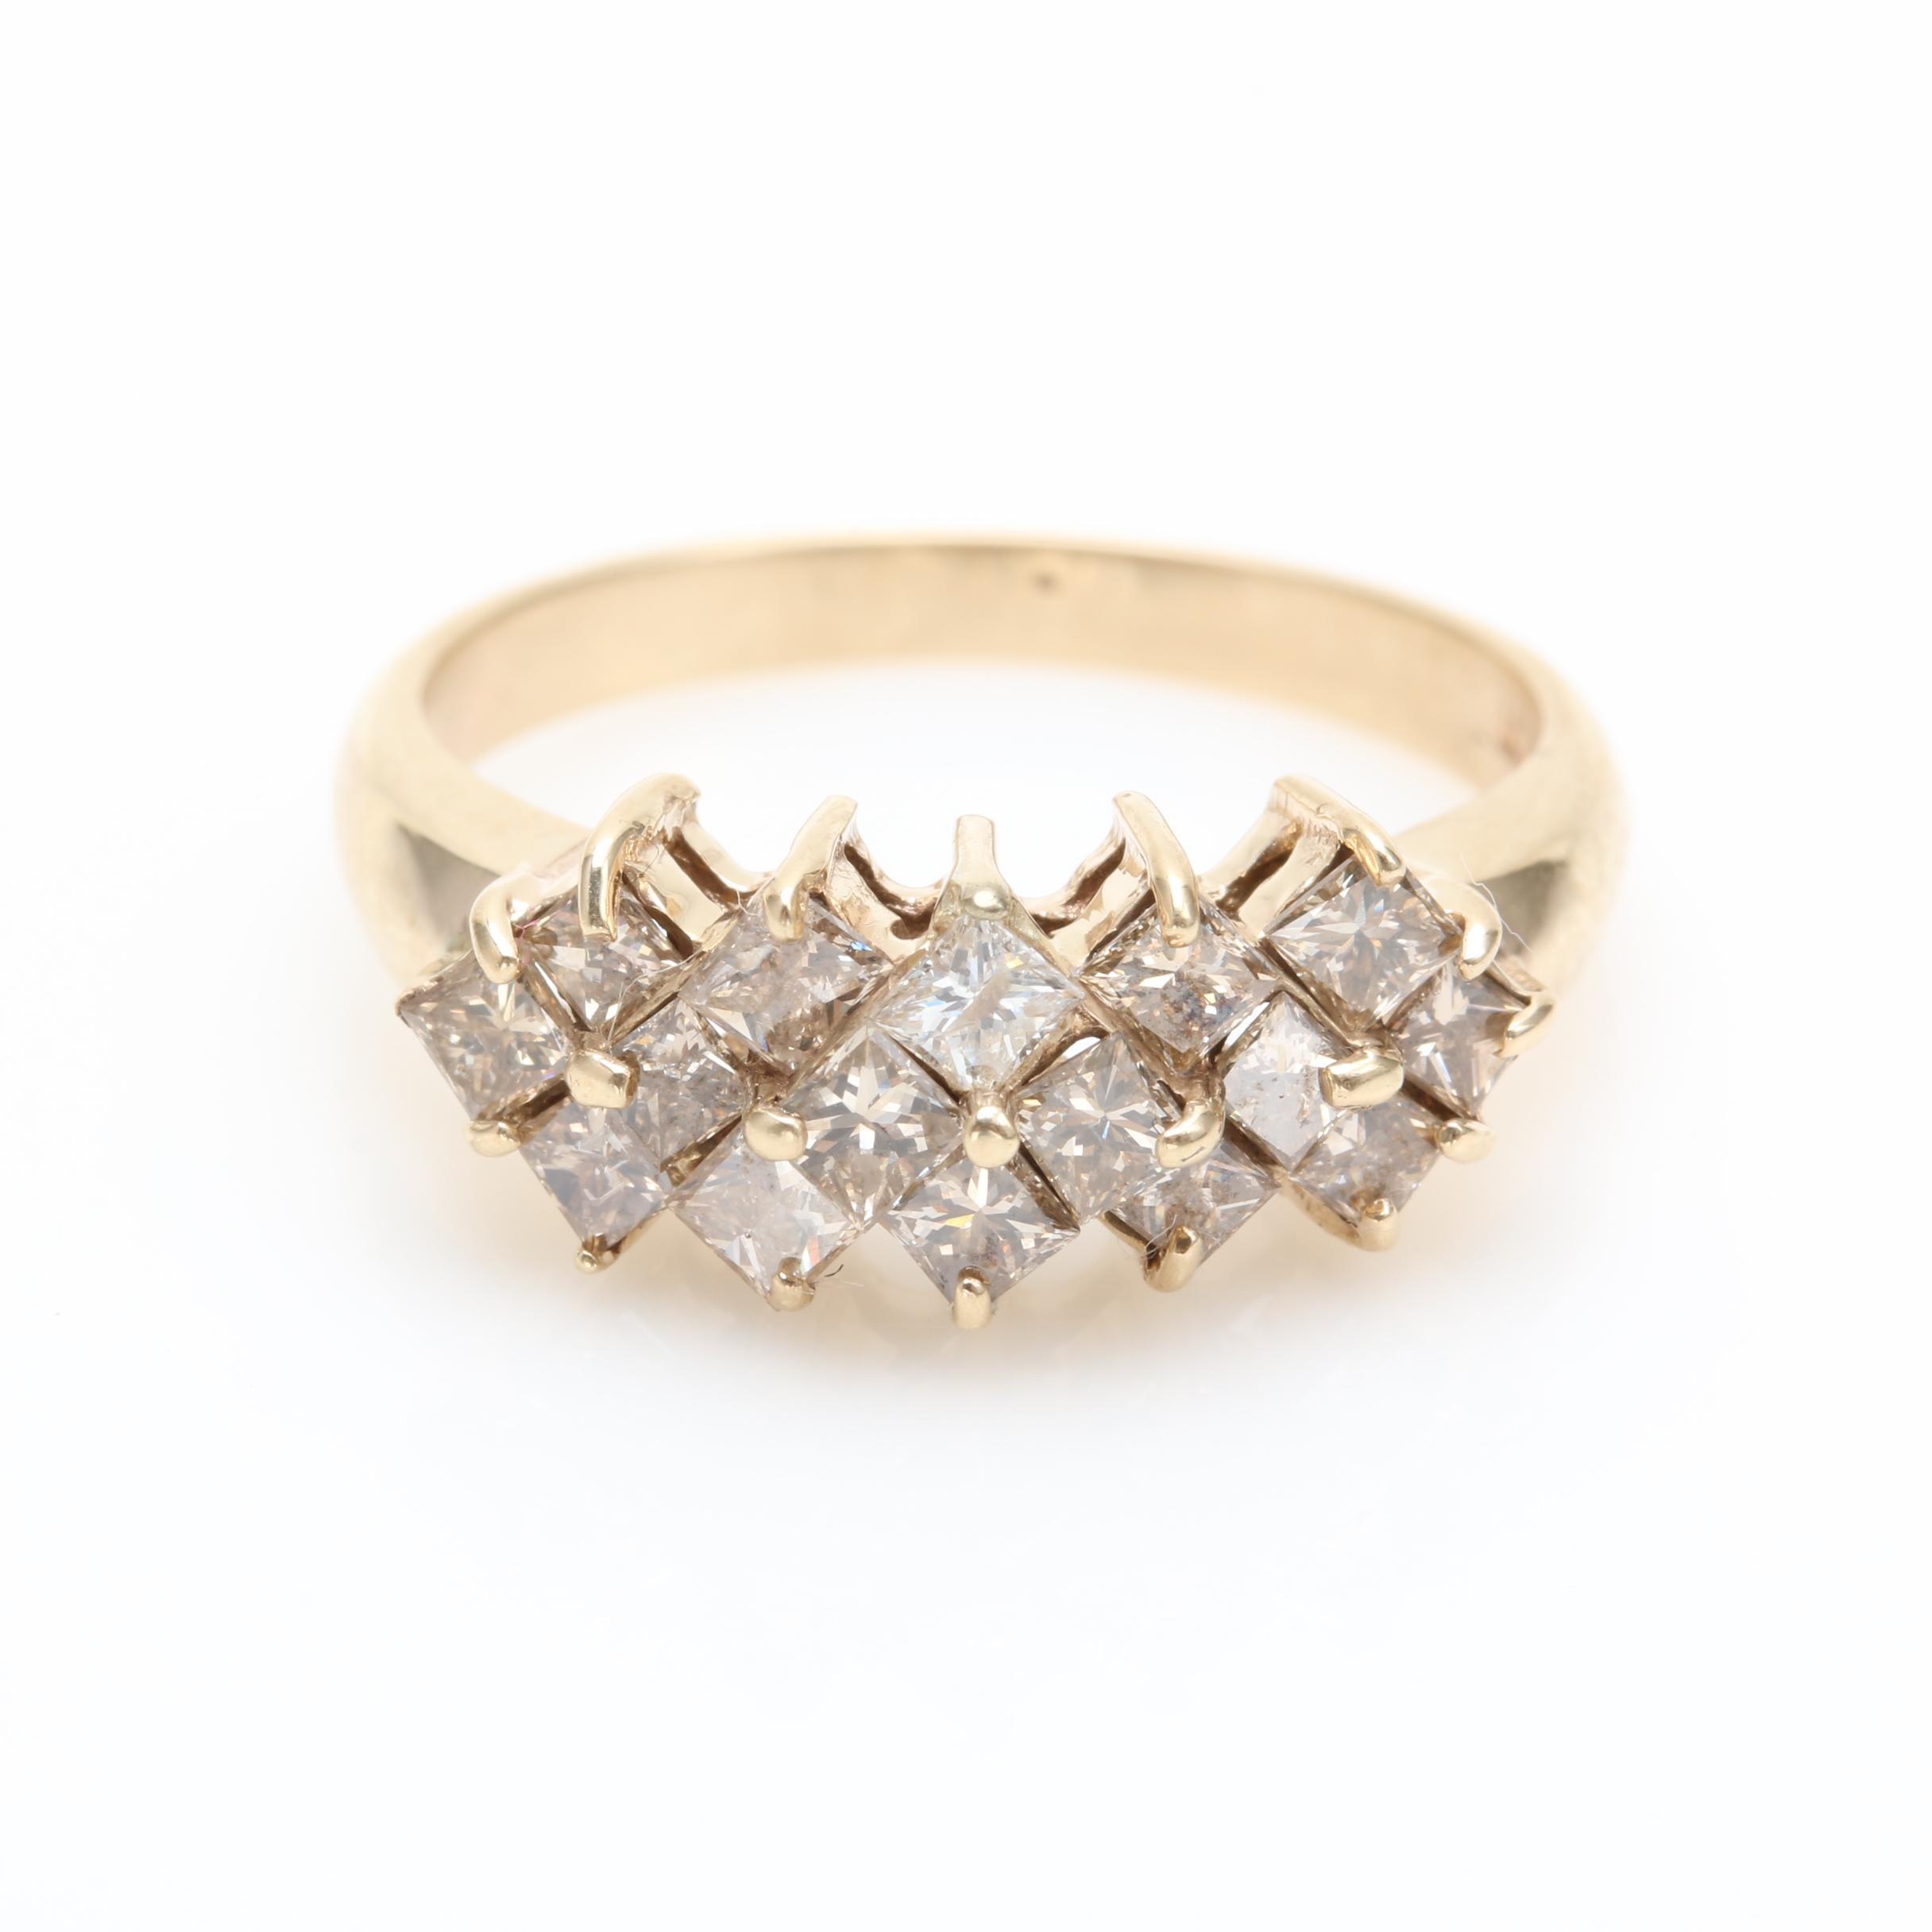 10K Yellow Gold 1.28 CTW Diamond Ring